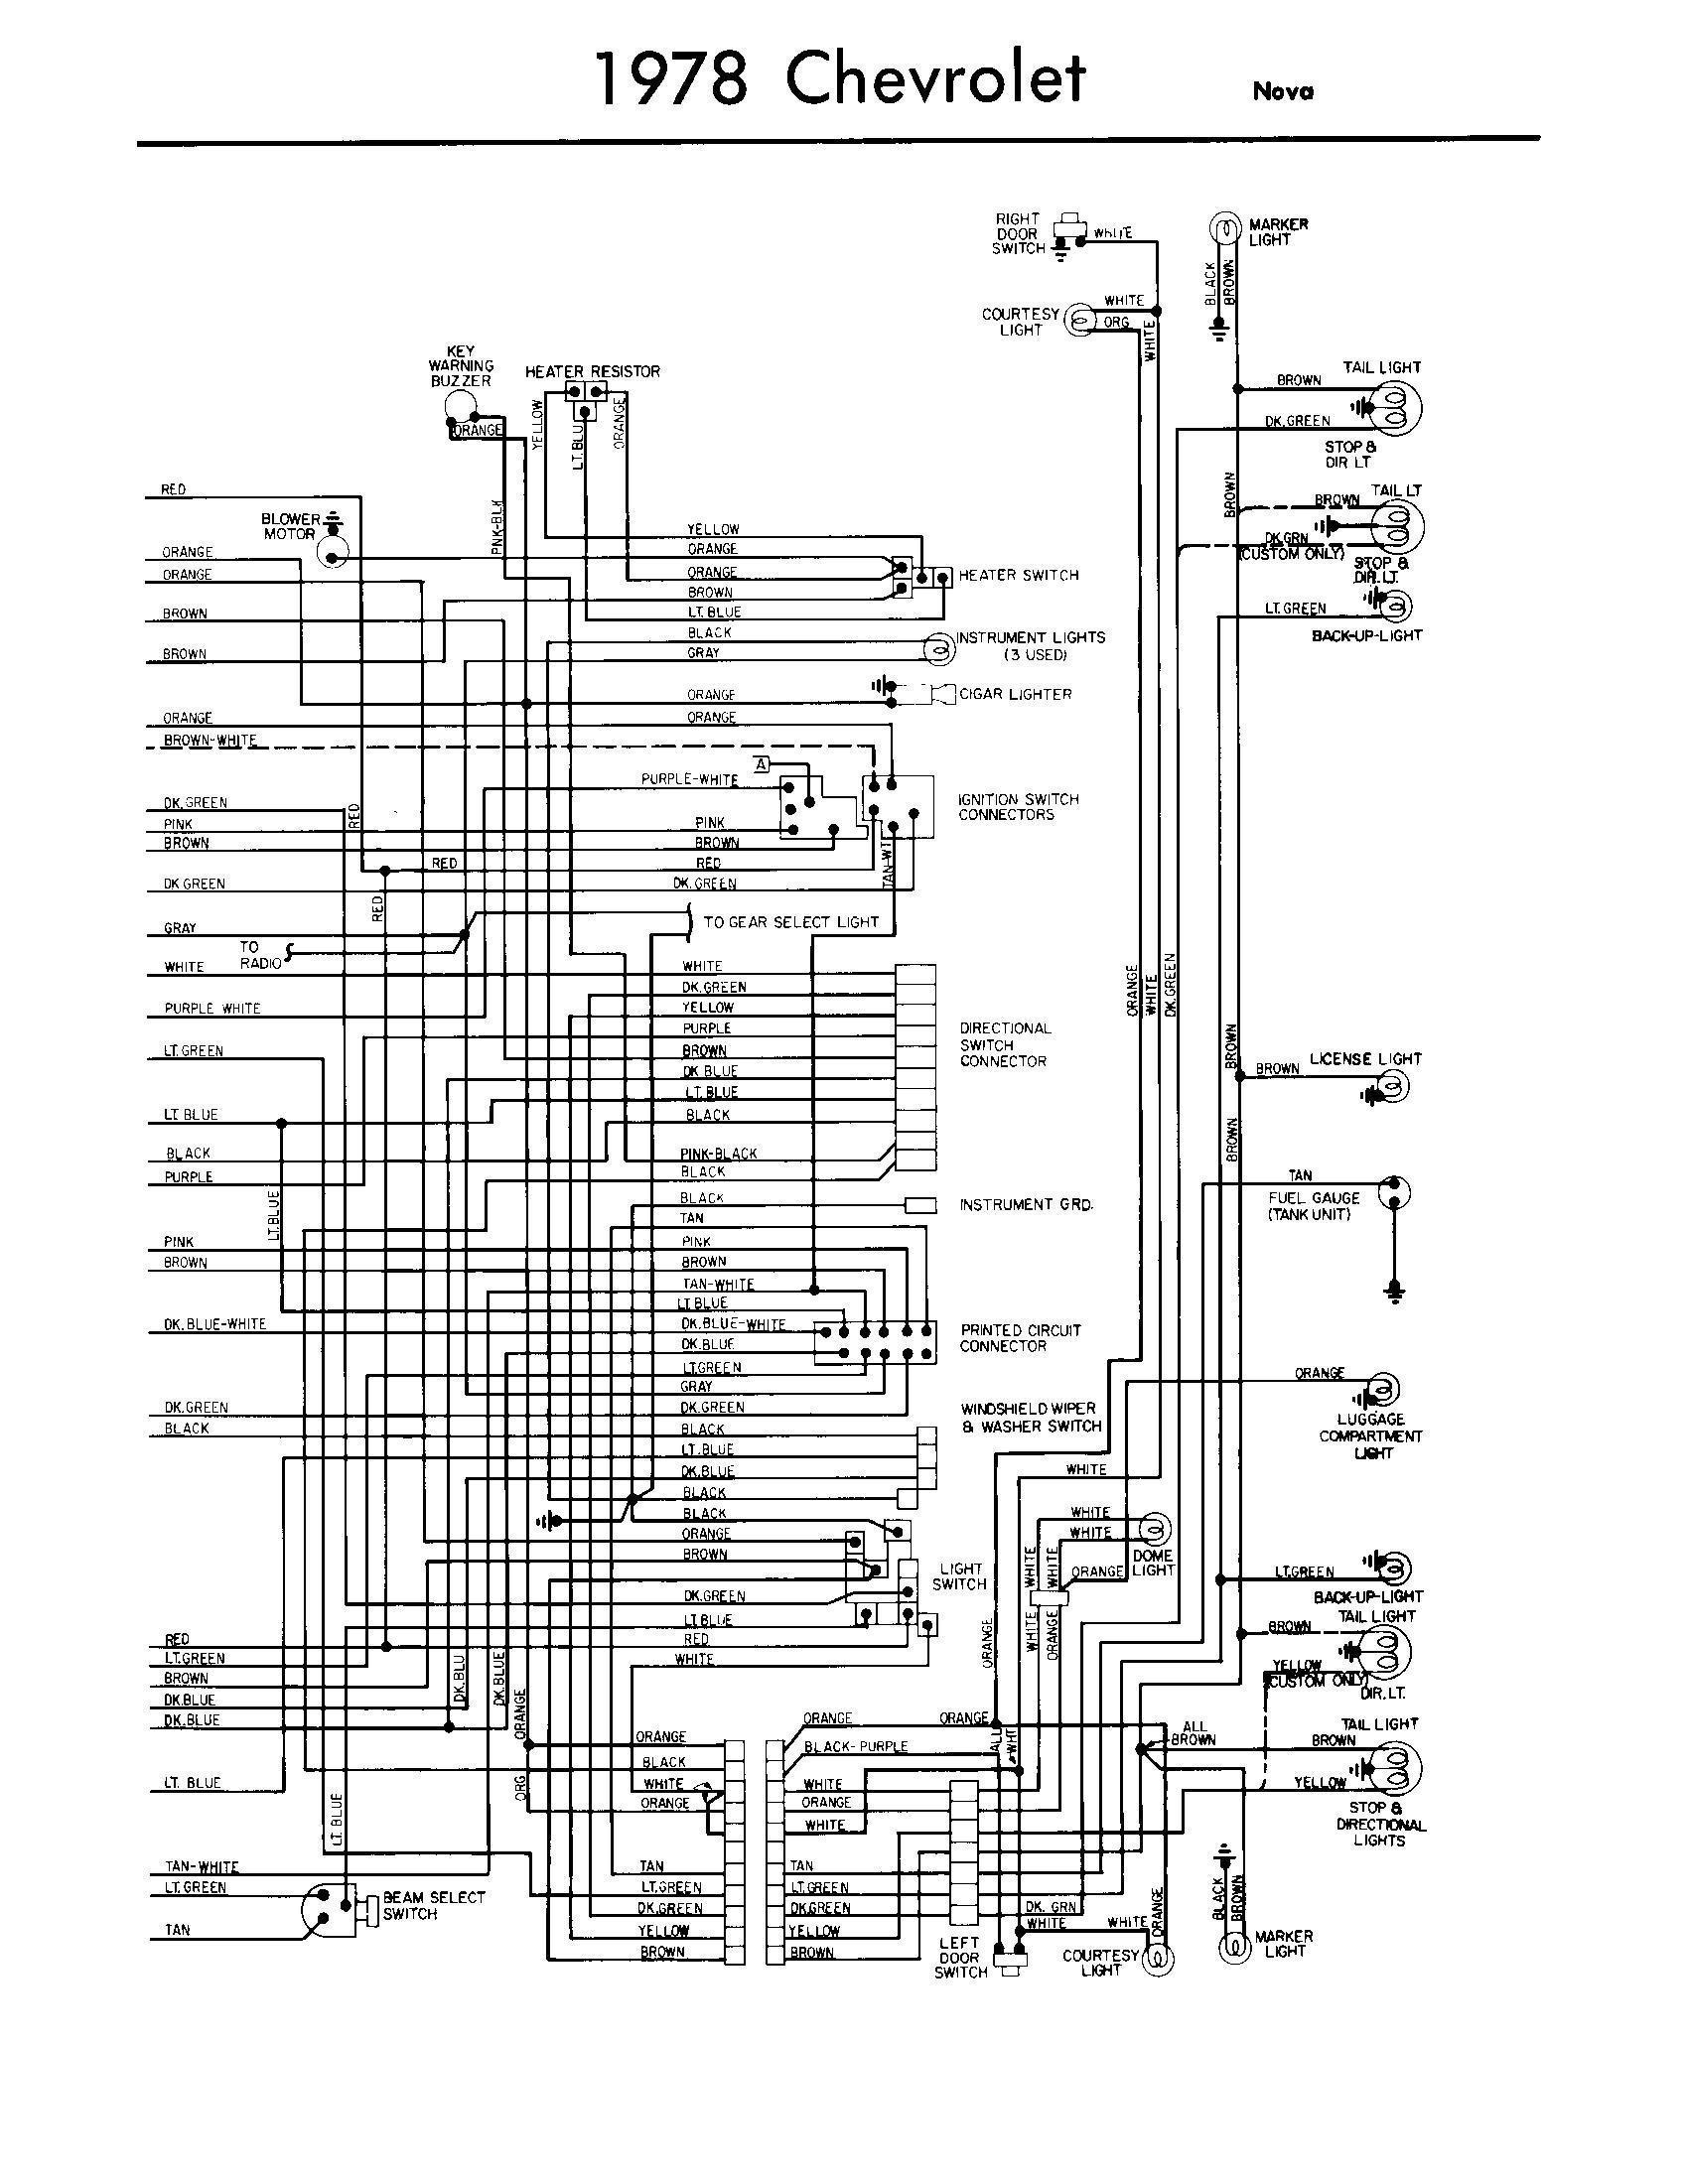 Chevrolet Truck Wiring Diagrams 83 Chevy Truck Wiring Diagram Wiring Diagram toolbox Of Chevrolet Truck Wiring Diagrams